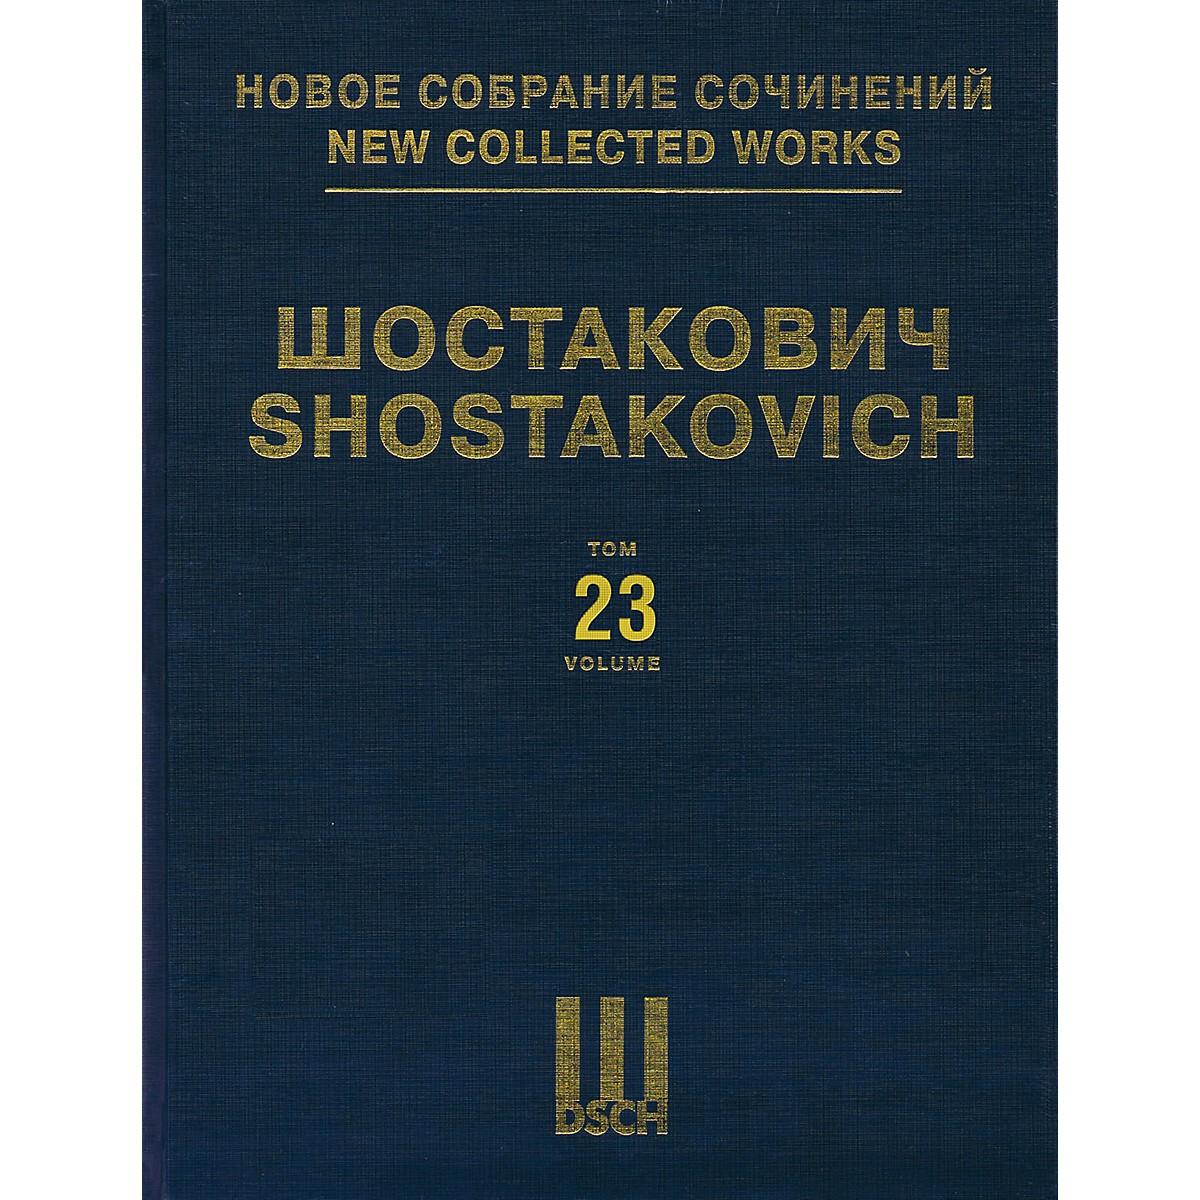 DSCH Symphony No. 8 - Piano Score DSCH Series Hardcover Composed by Dmitri Shostakovich